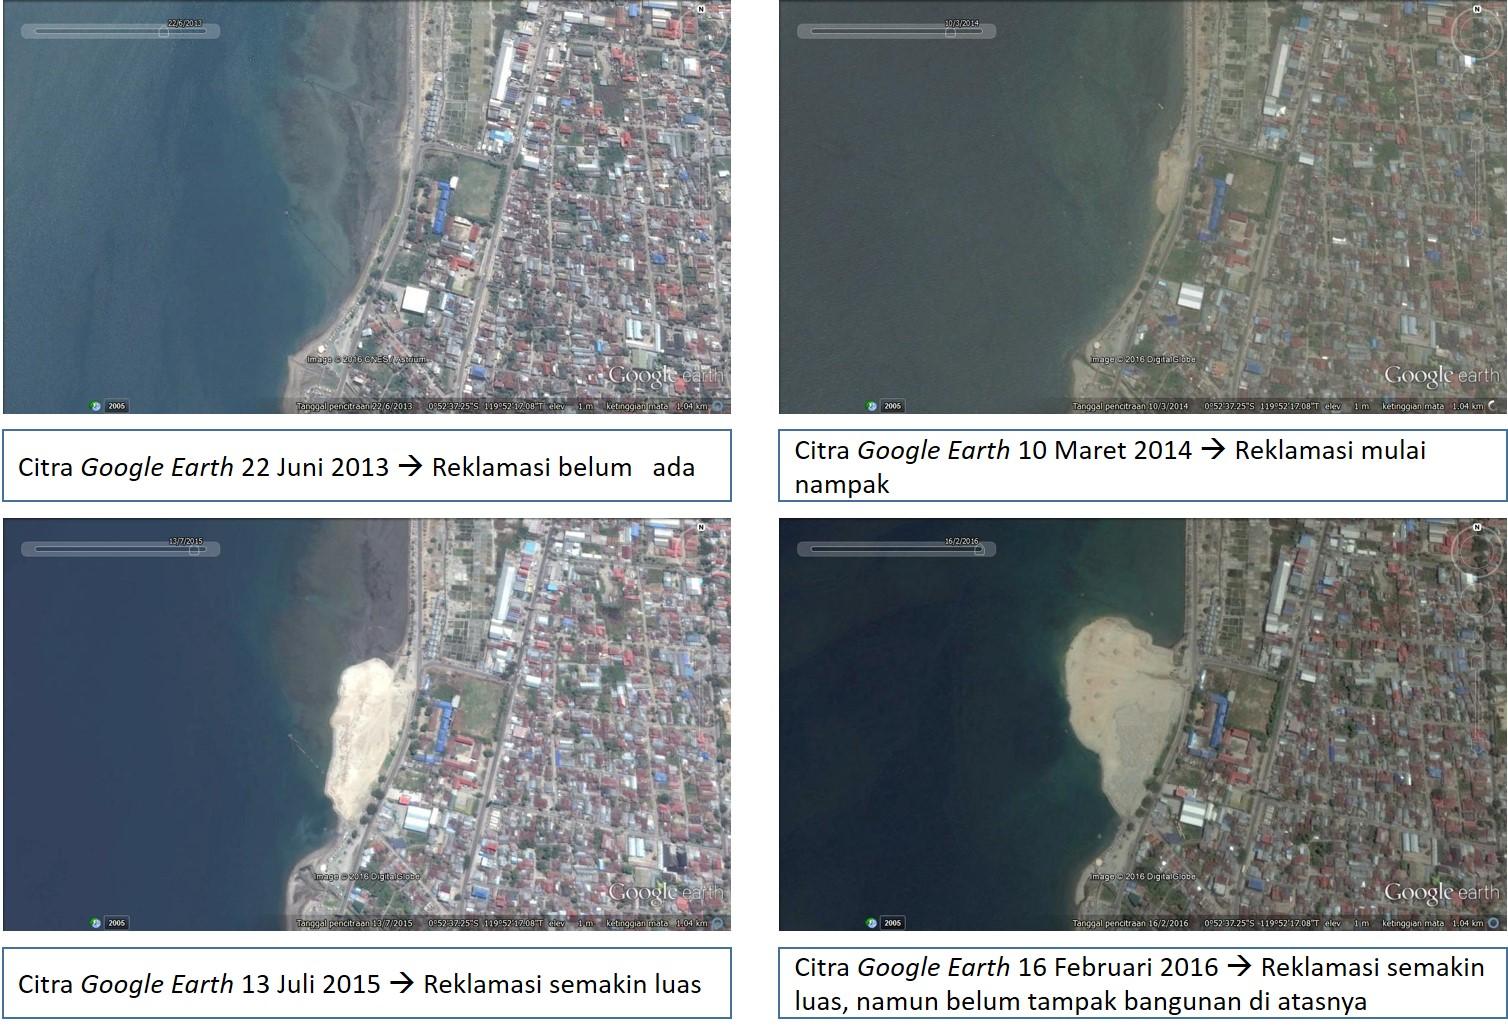 Rangkaian citra progres reklamasi di Teluk Palu, Kota Palu, Provinsi Sulawesi Tengah. Sumber: Google Earth